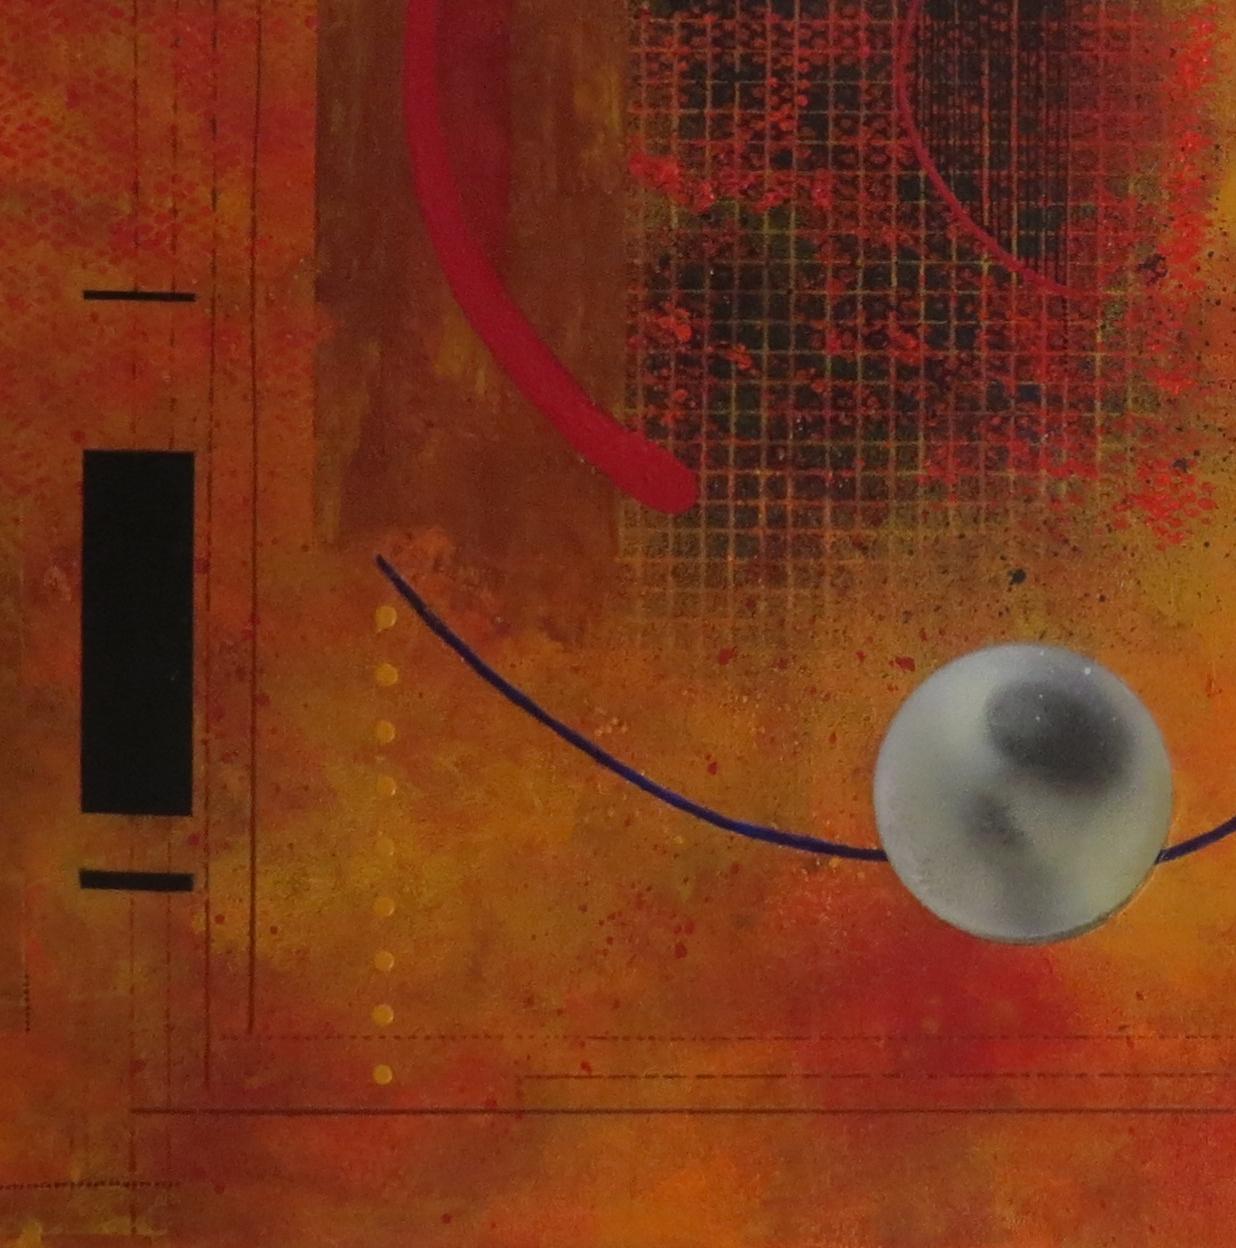 dzëta - vue zoom3 - DALUZ GALEGO - peinture abstraite